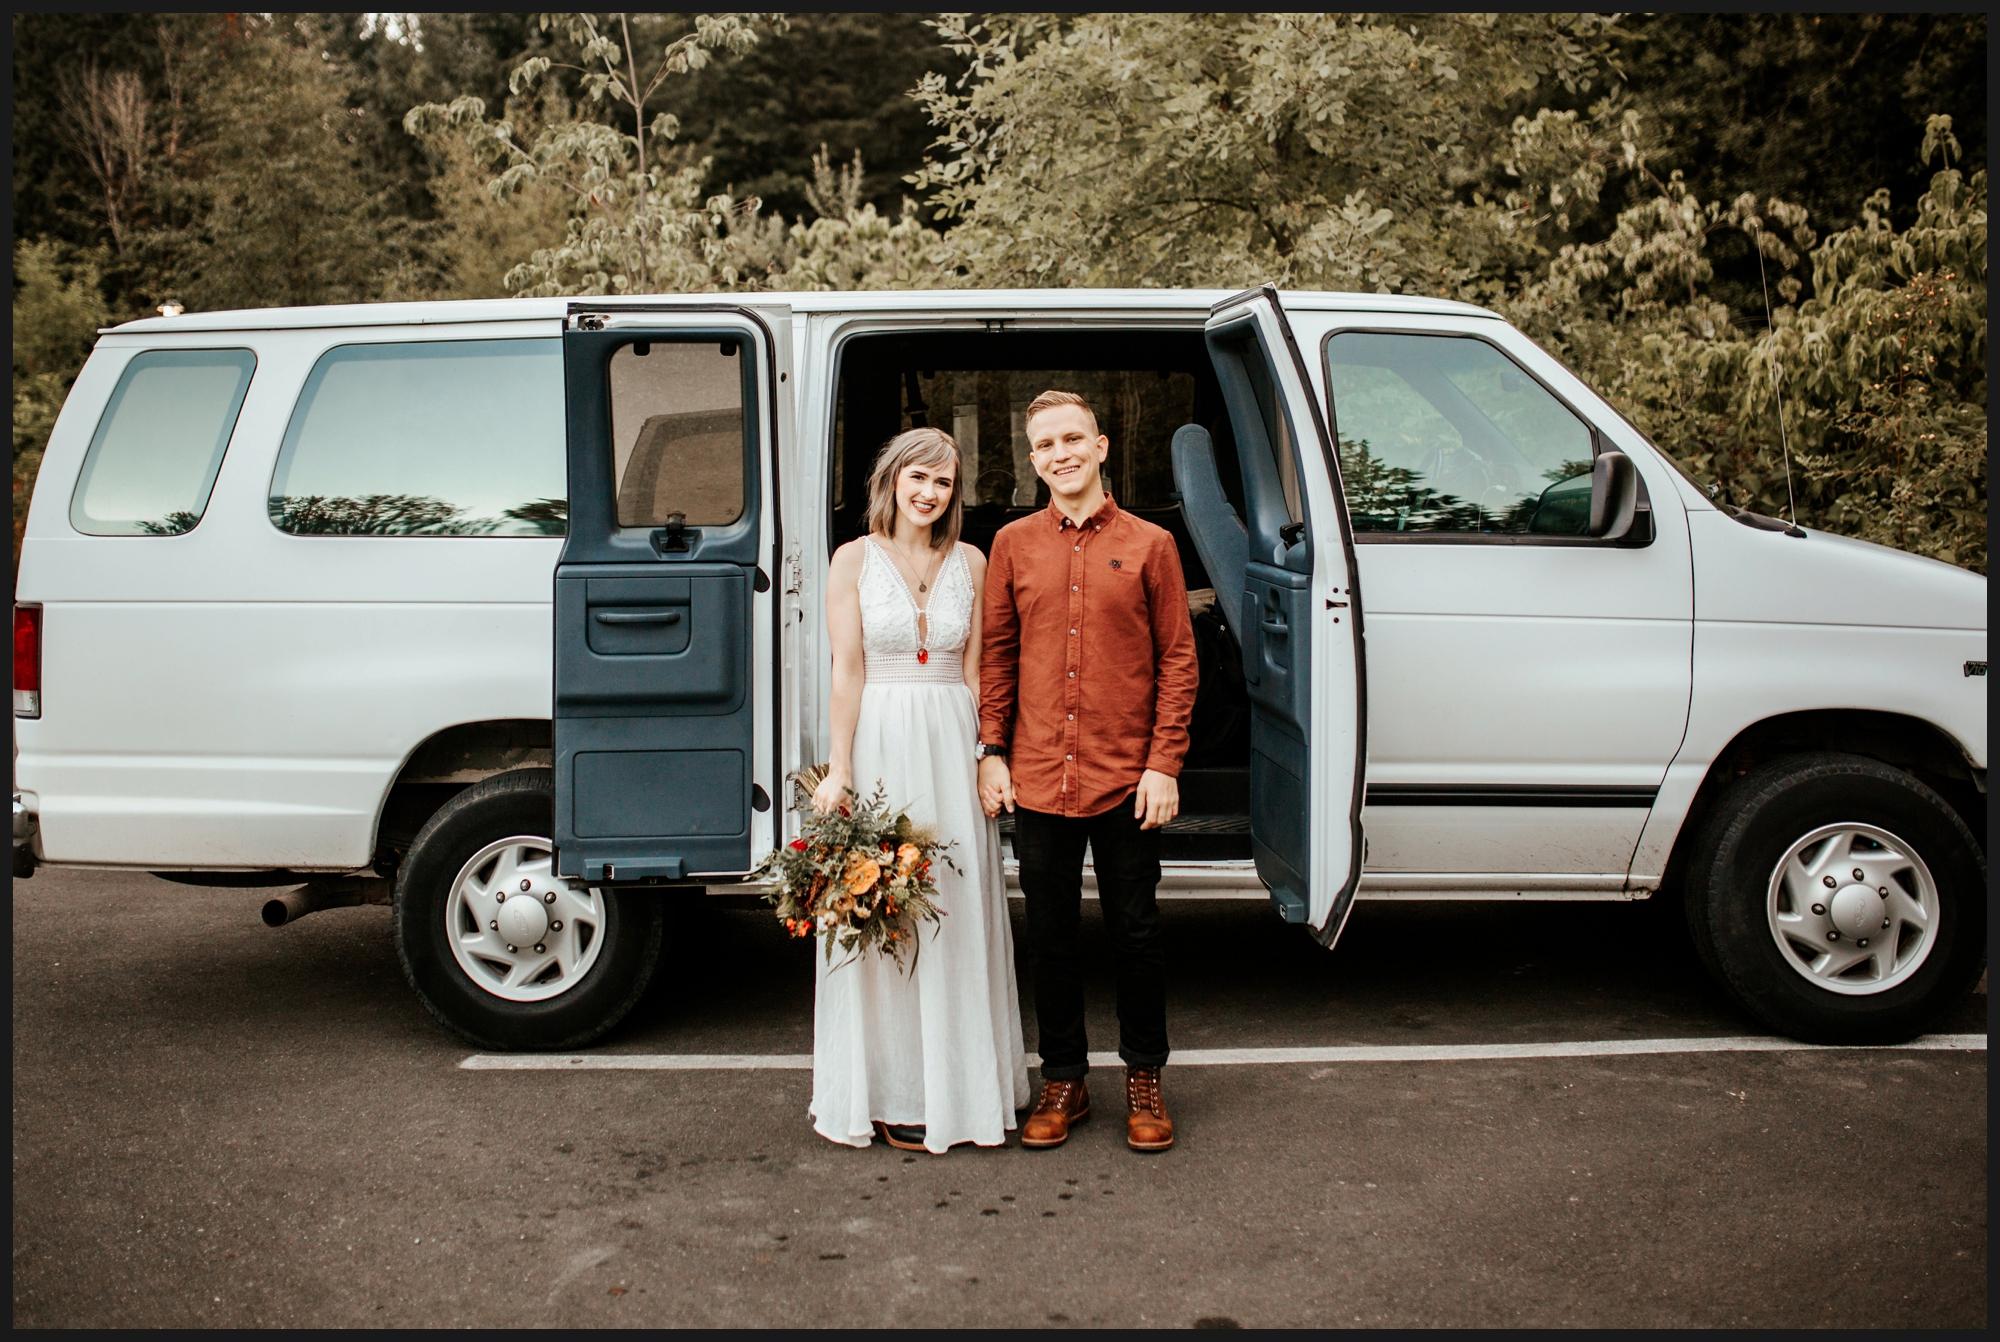 Orlando-Wedding-Photographer-destination-wedding-photographer-florida-wedding-photographer-bohemian-wedding-photographer_0402.jpg